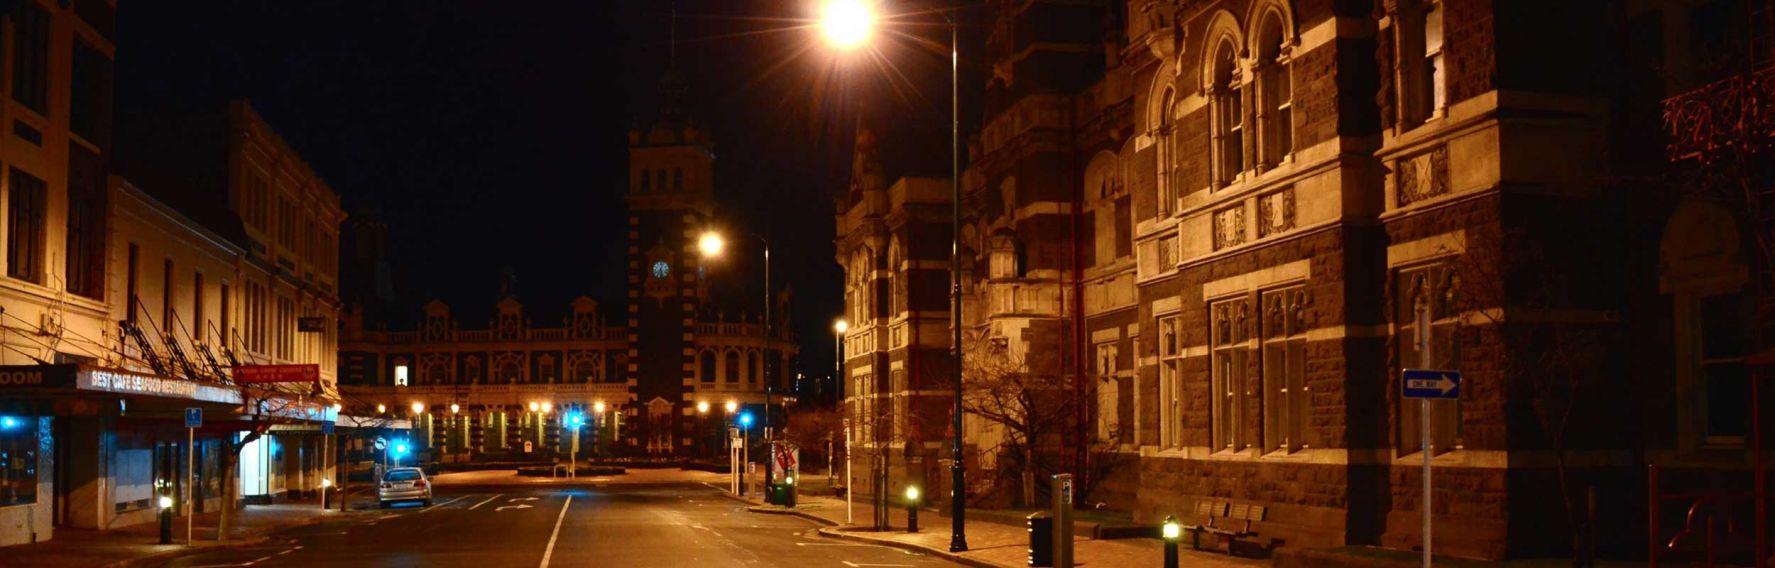 Screen Lower Stuart Street